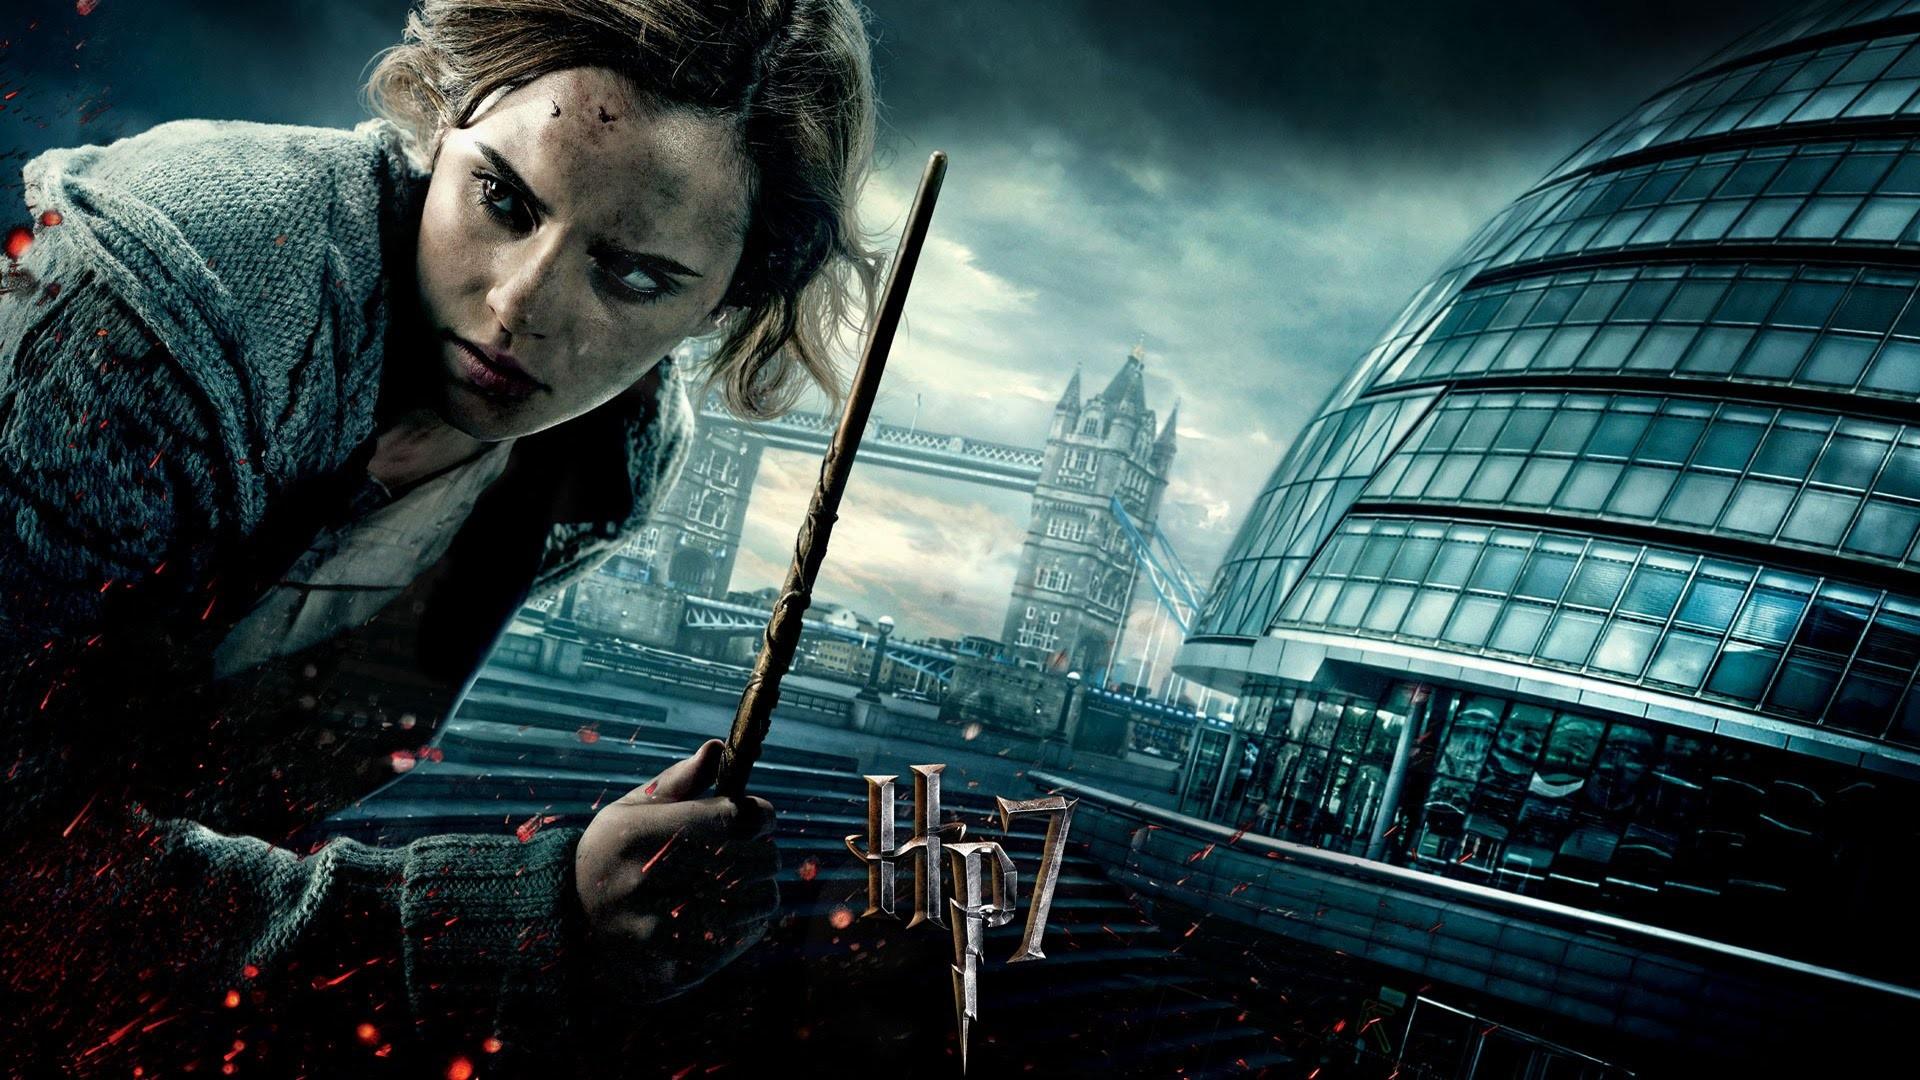 1080p Harry Potter Wallpaper-btm64x6 - Harry Potter Desktop Wallpaper Hermione - HD Wallpaper